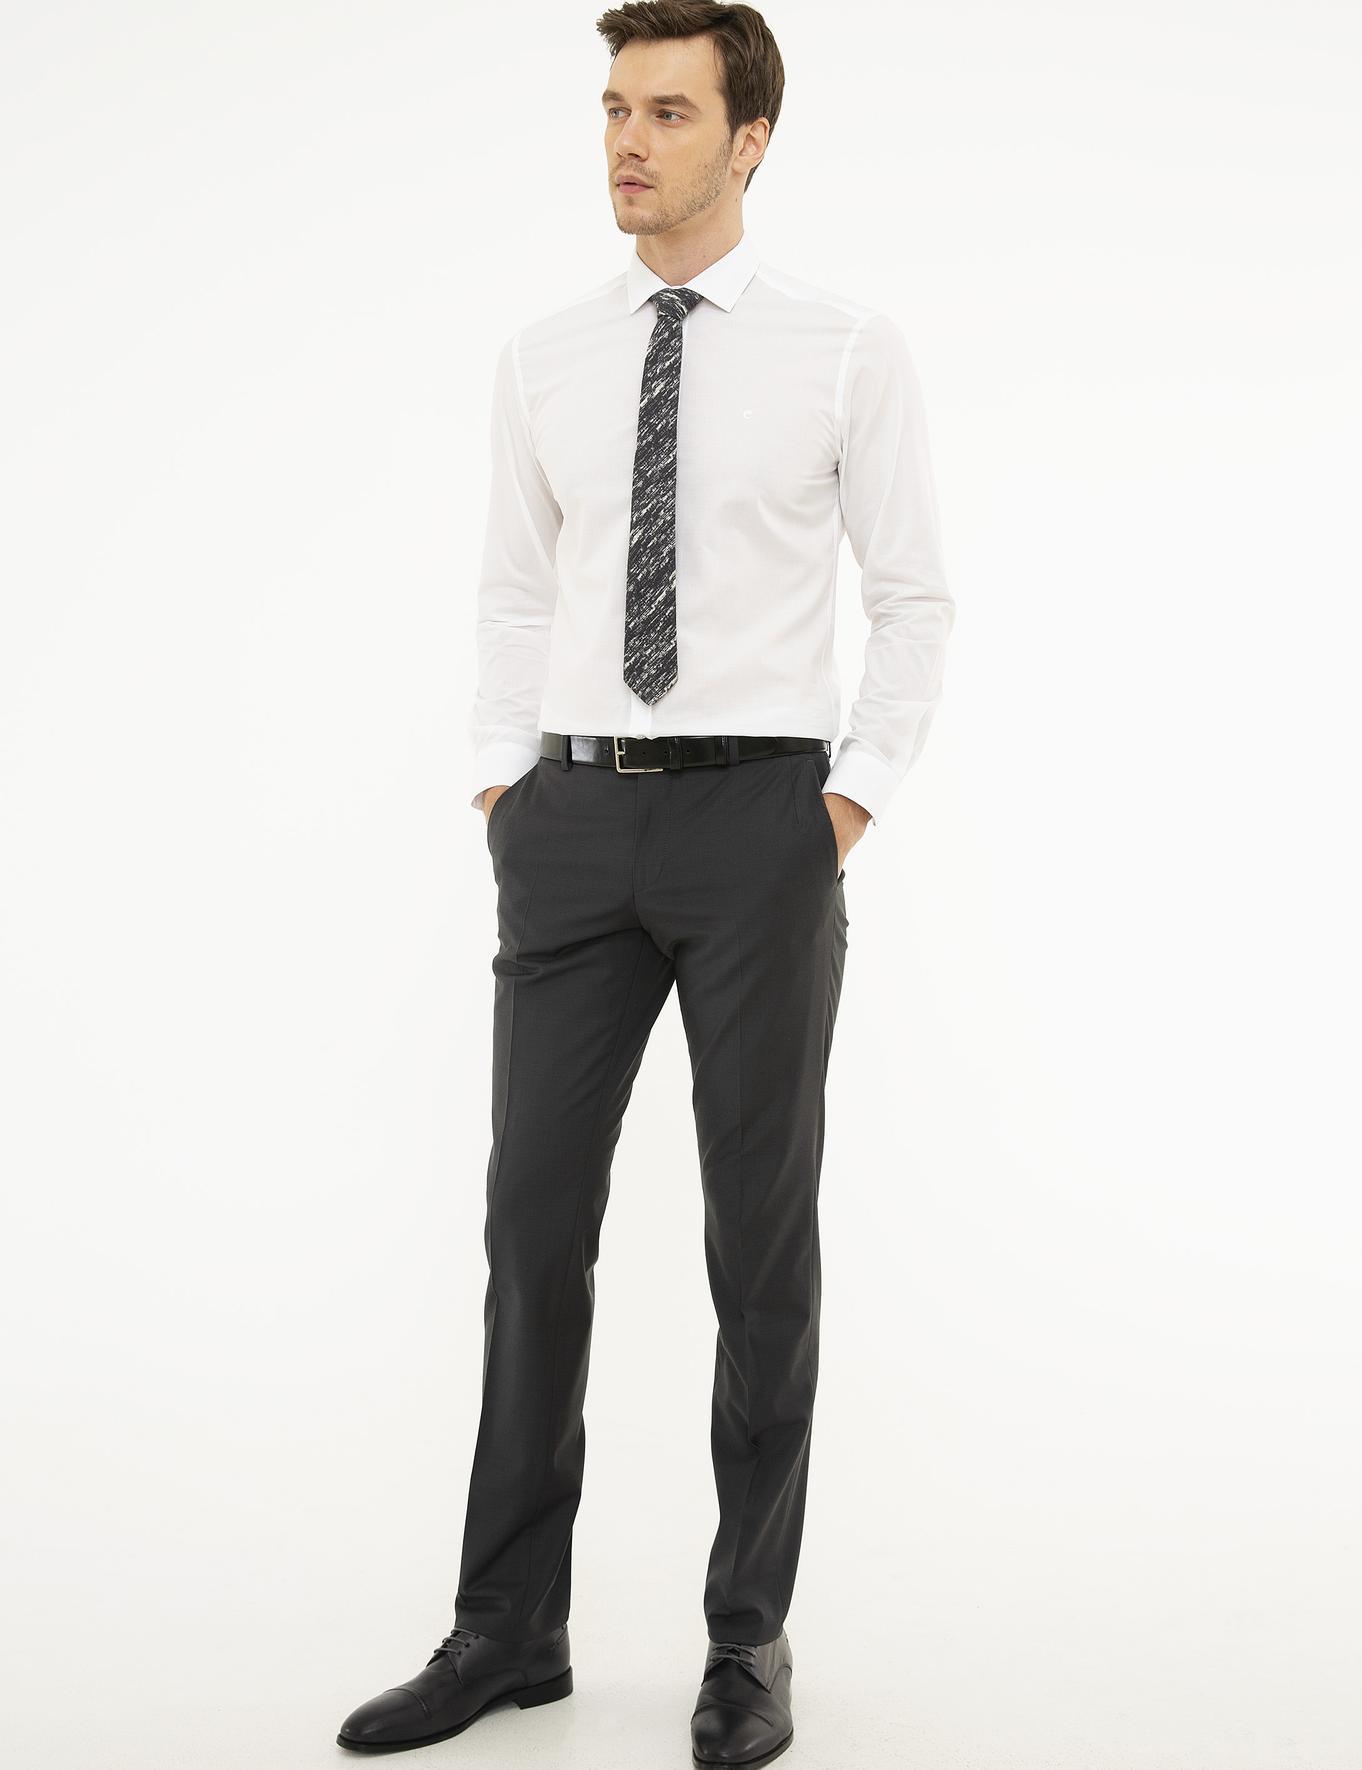 Beyaz Slim Fit Gömlek - 50219045001